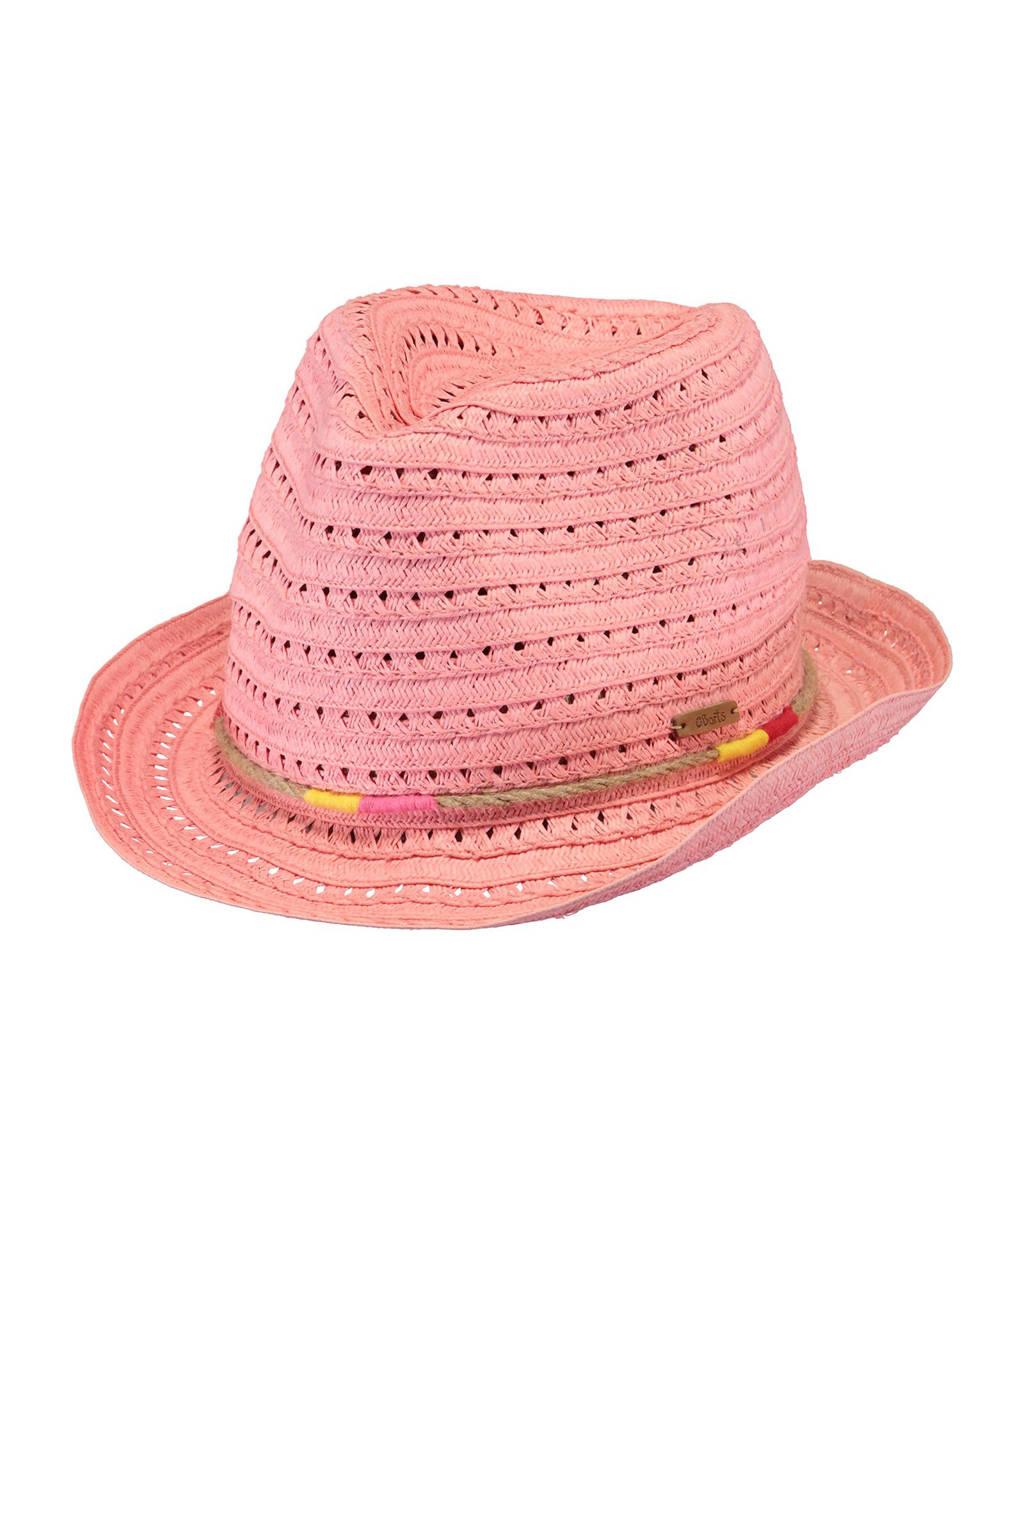 Barts Bartica Hat beige, Roze